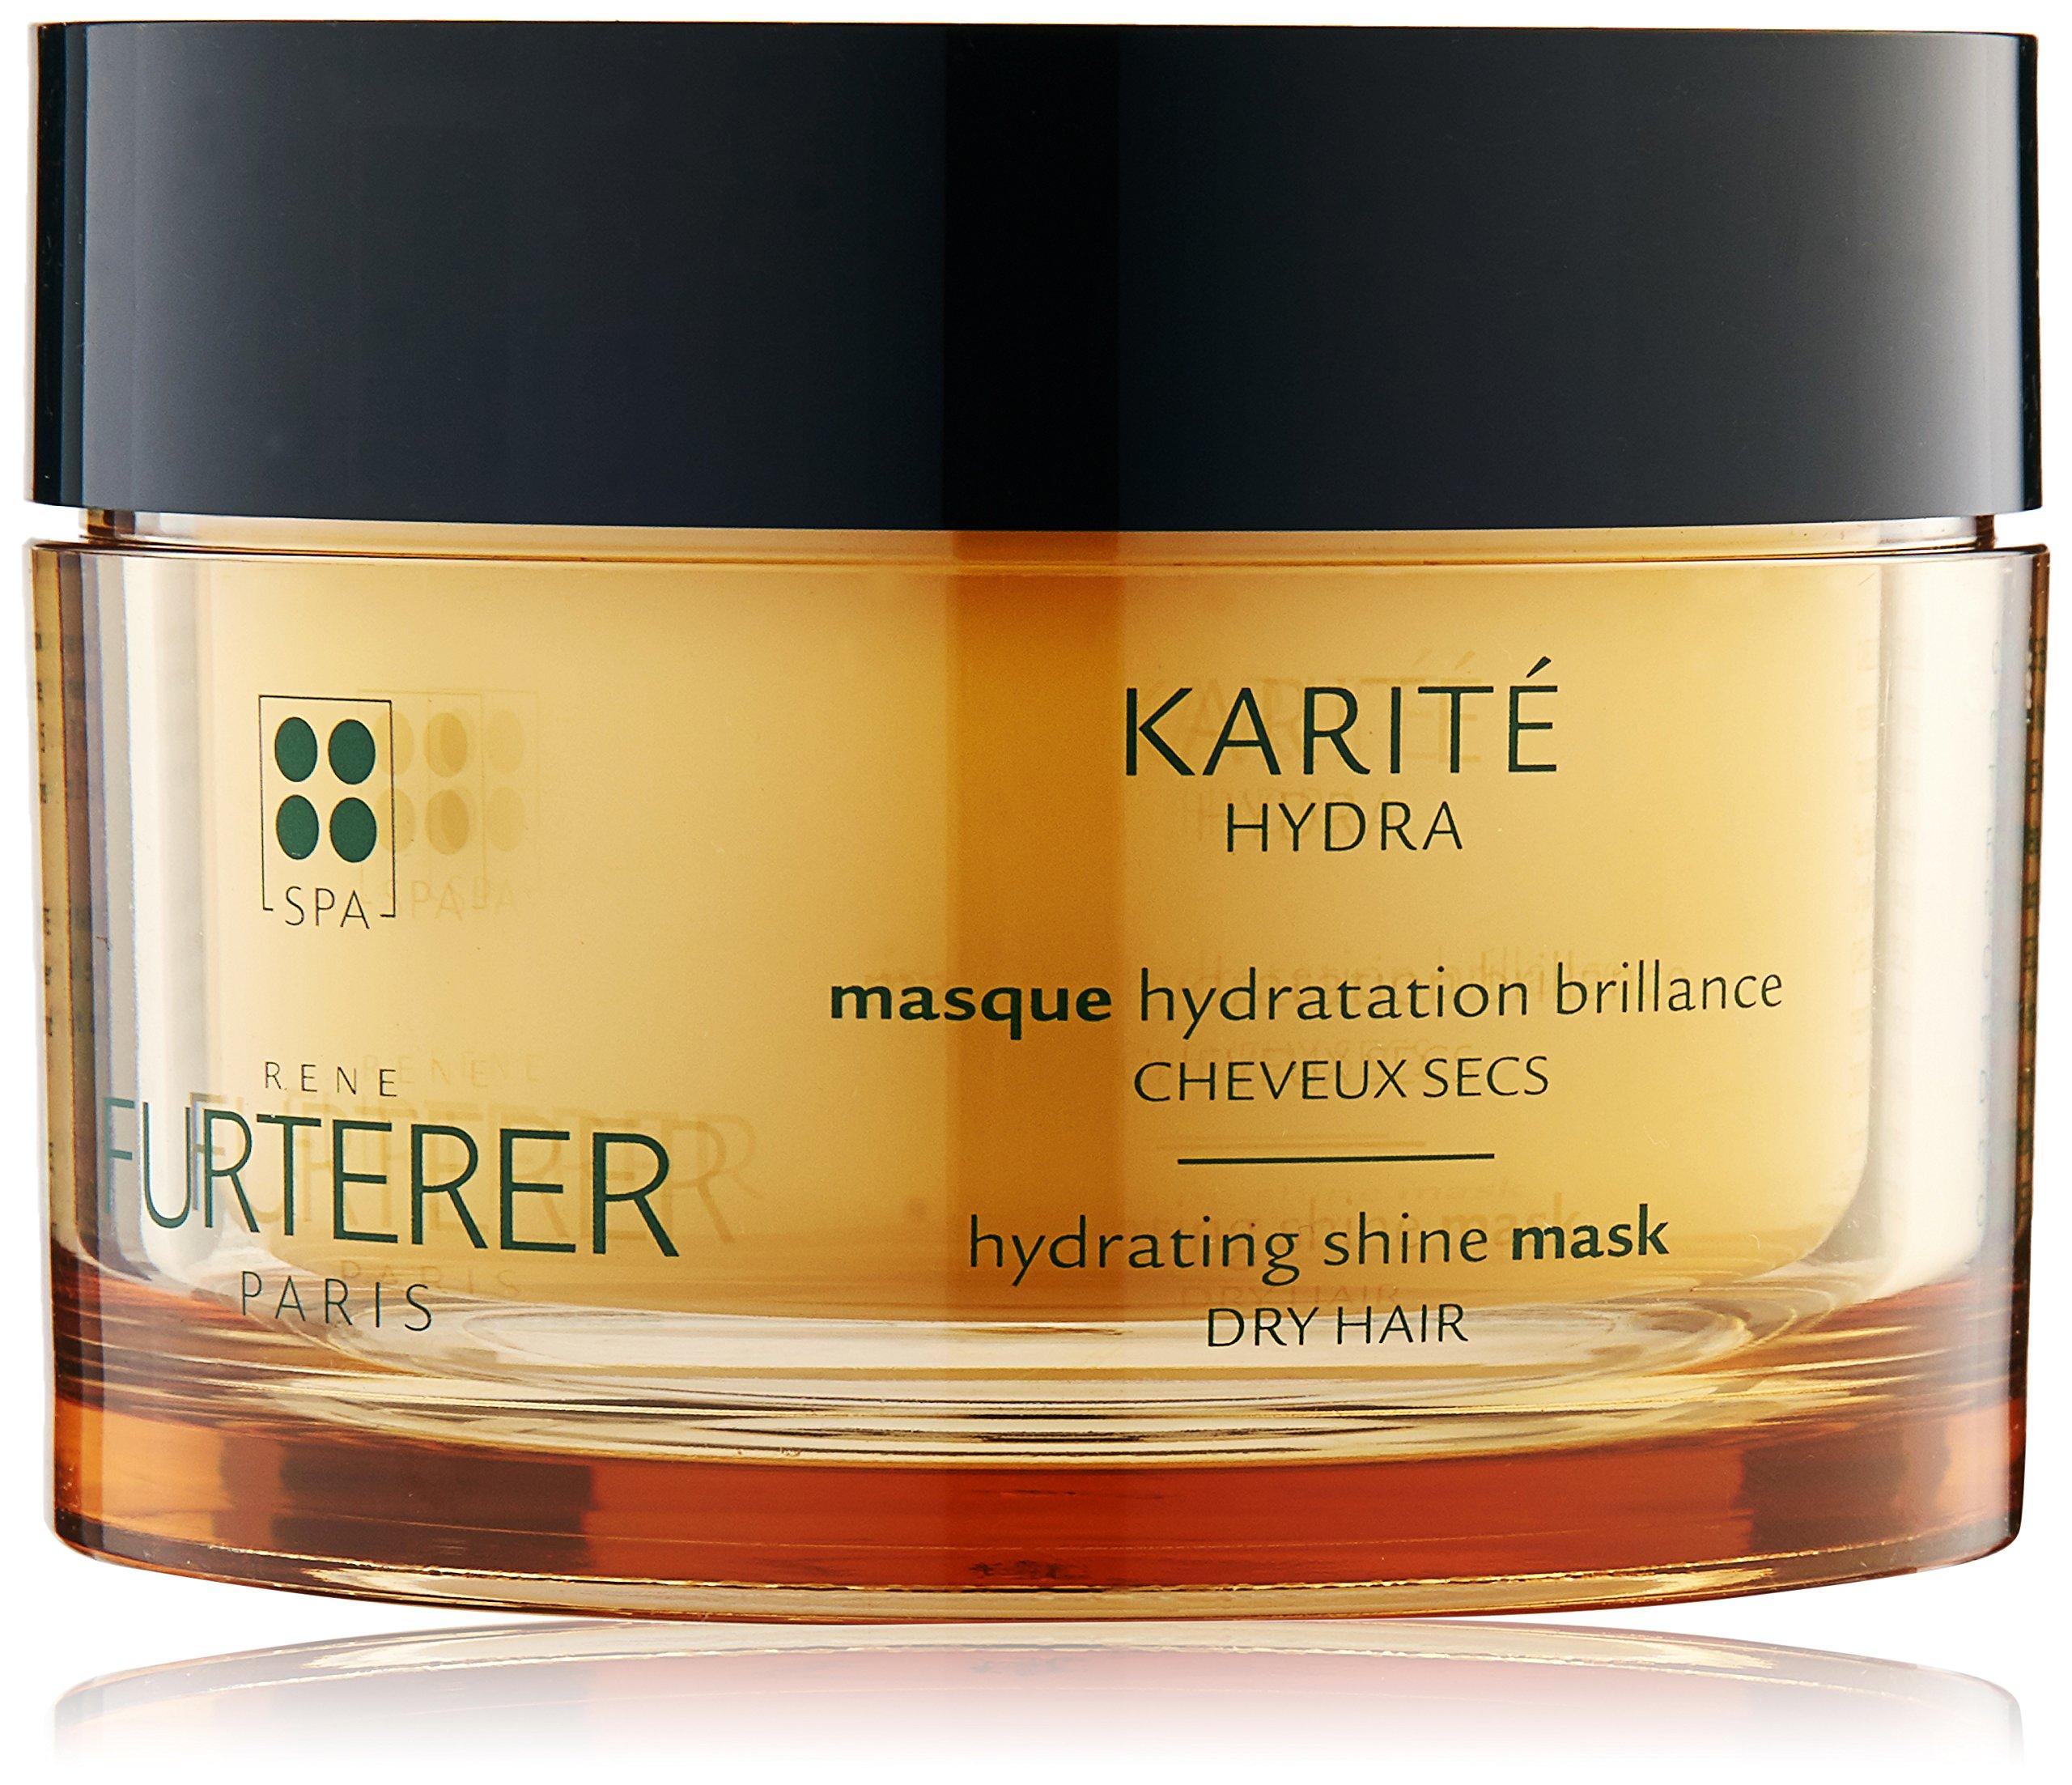 Rene Furterer Karite Hydra Hydrating Shine Mask, 6.9 Ounce